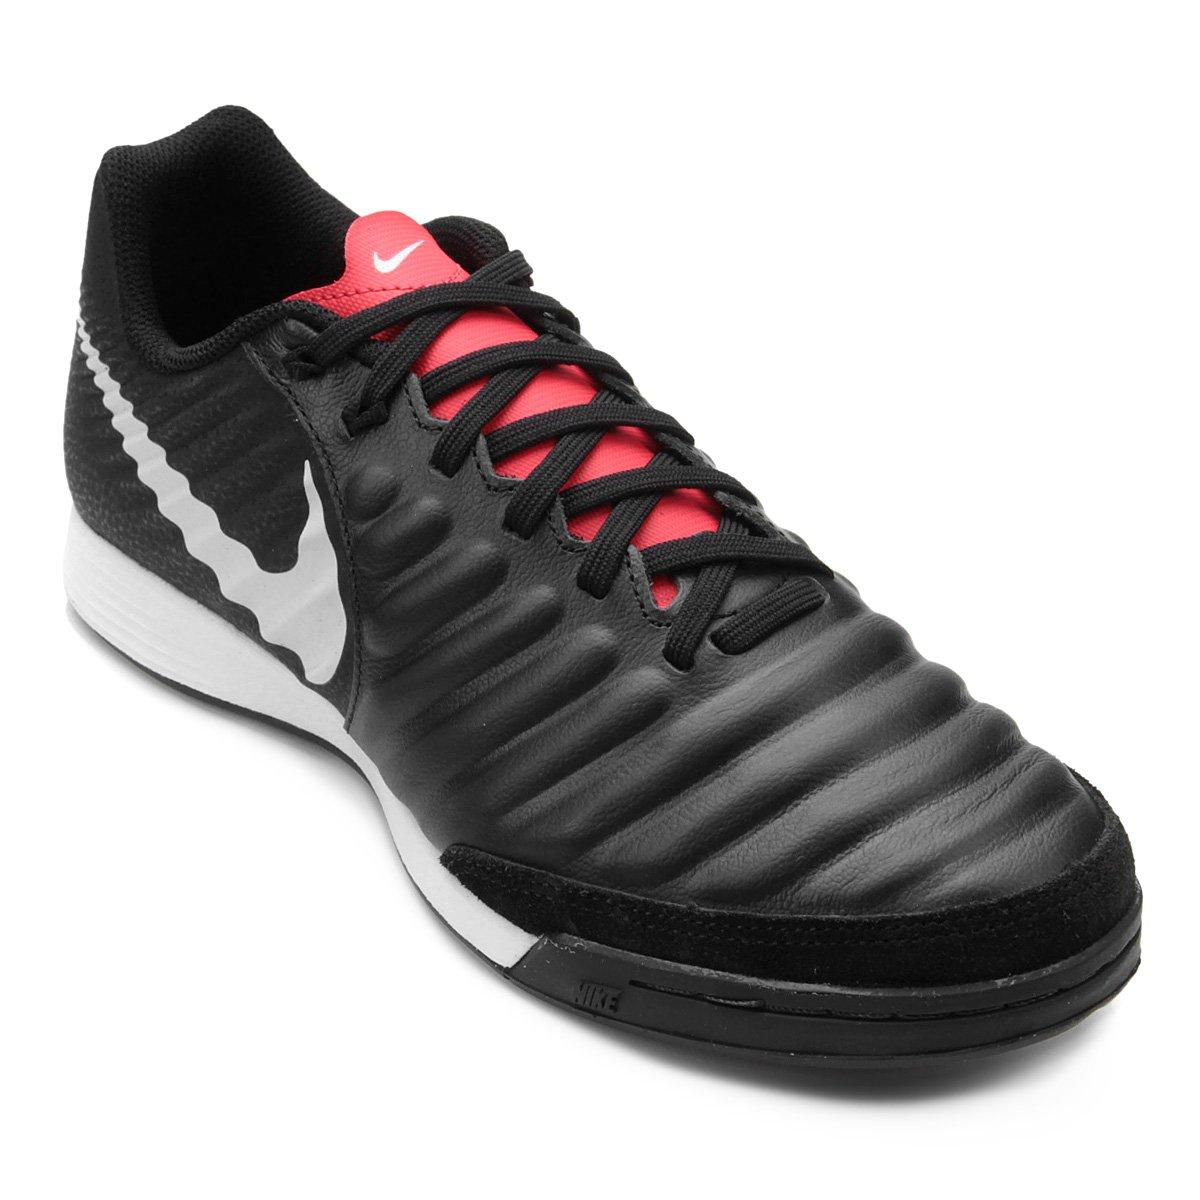 Estar confundido Regresa personaje  Chuteira Futsal Nike Tiempo Legend 7 Academy IC | Allianz Parque Shop